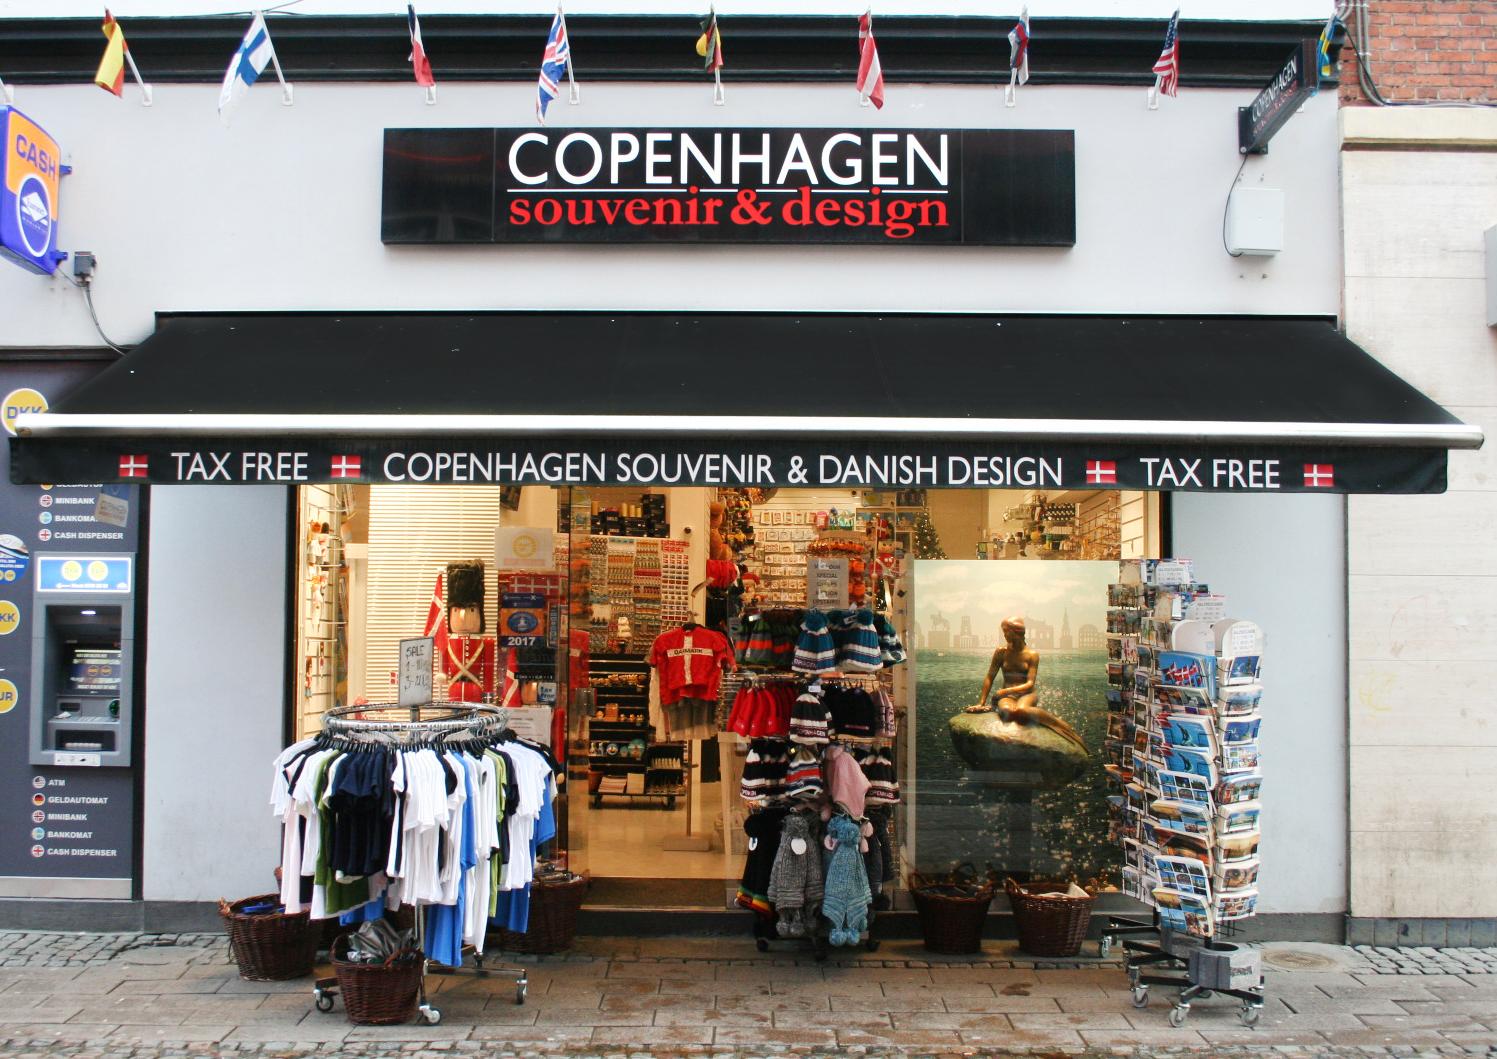 Frederiksberggade 23